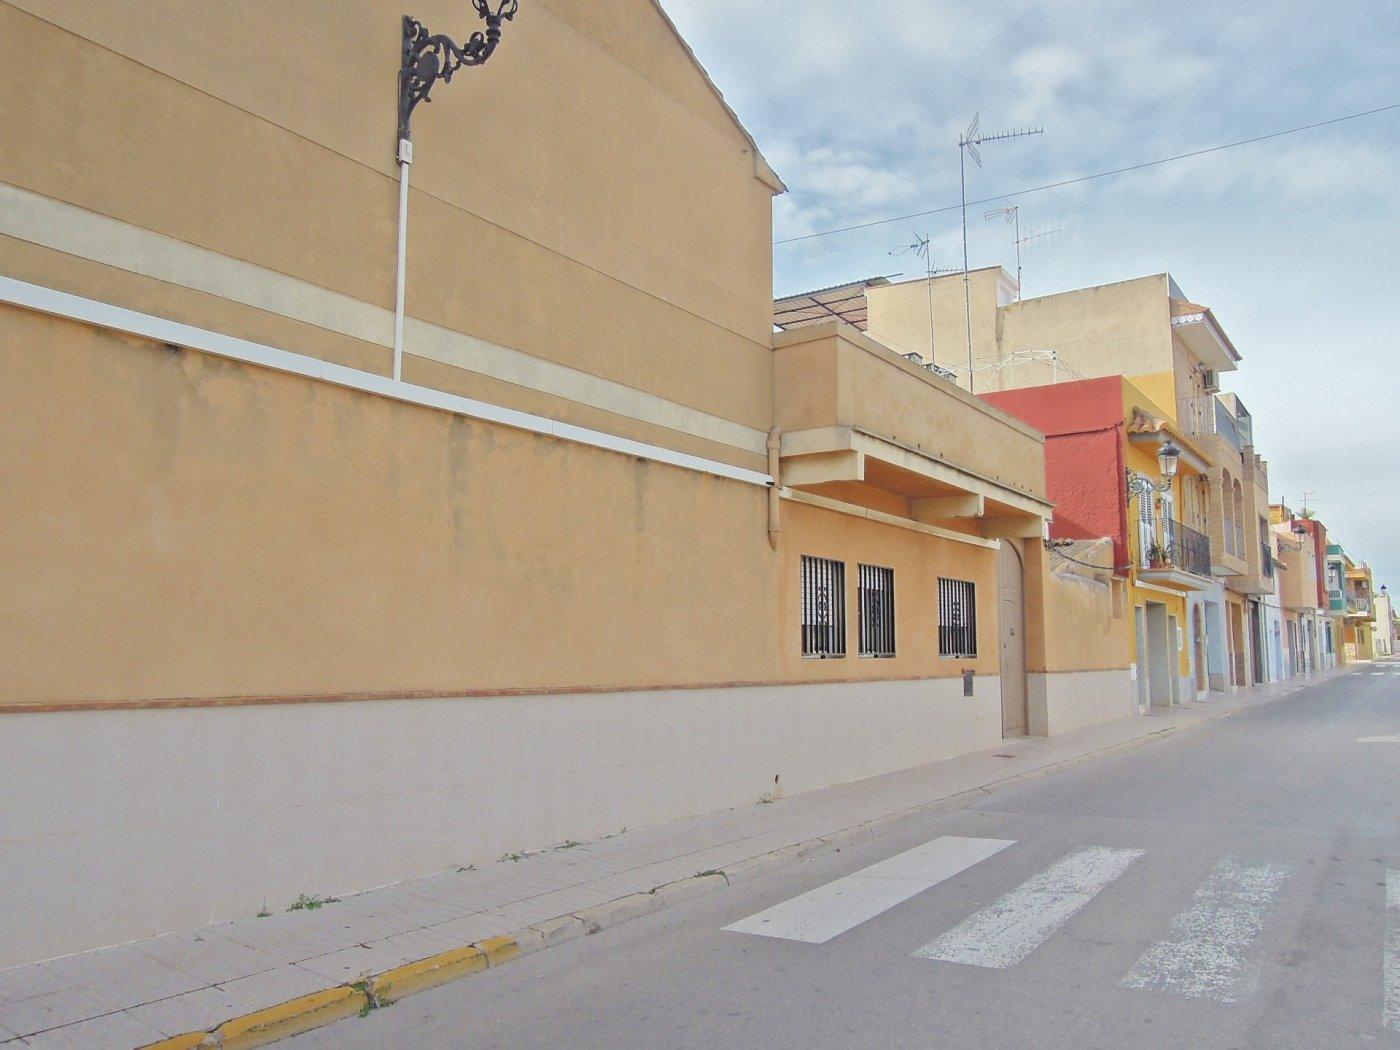 Terrain urbain  Rafelbuñol - rafelbunyol ,l  zona de - rafelbuñol - rafelbunyol. Amantes del casco antiguo